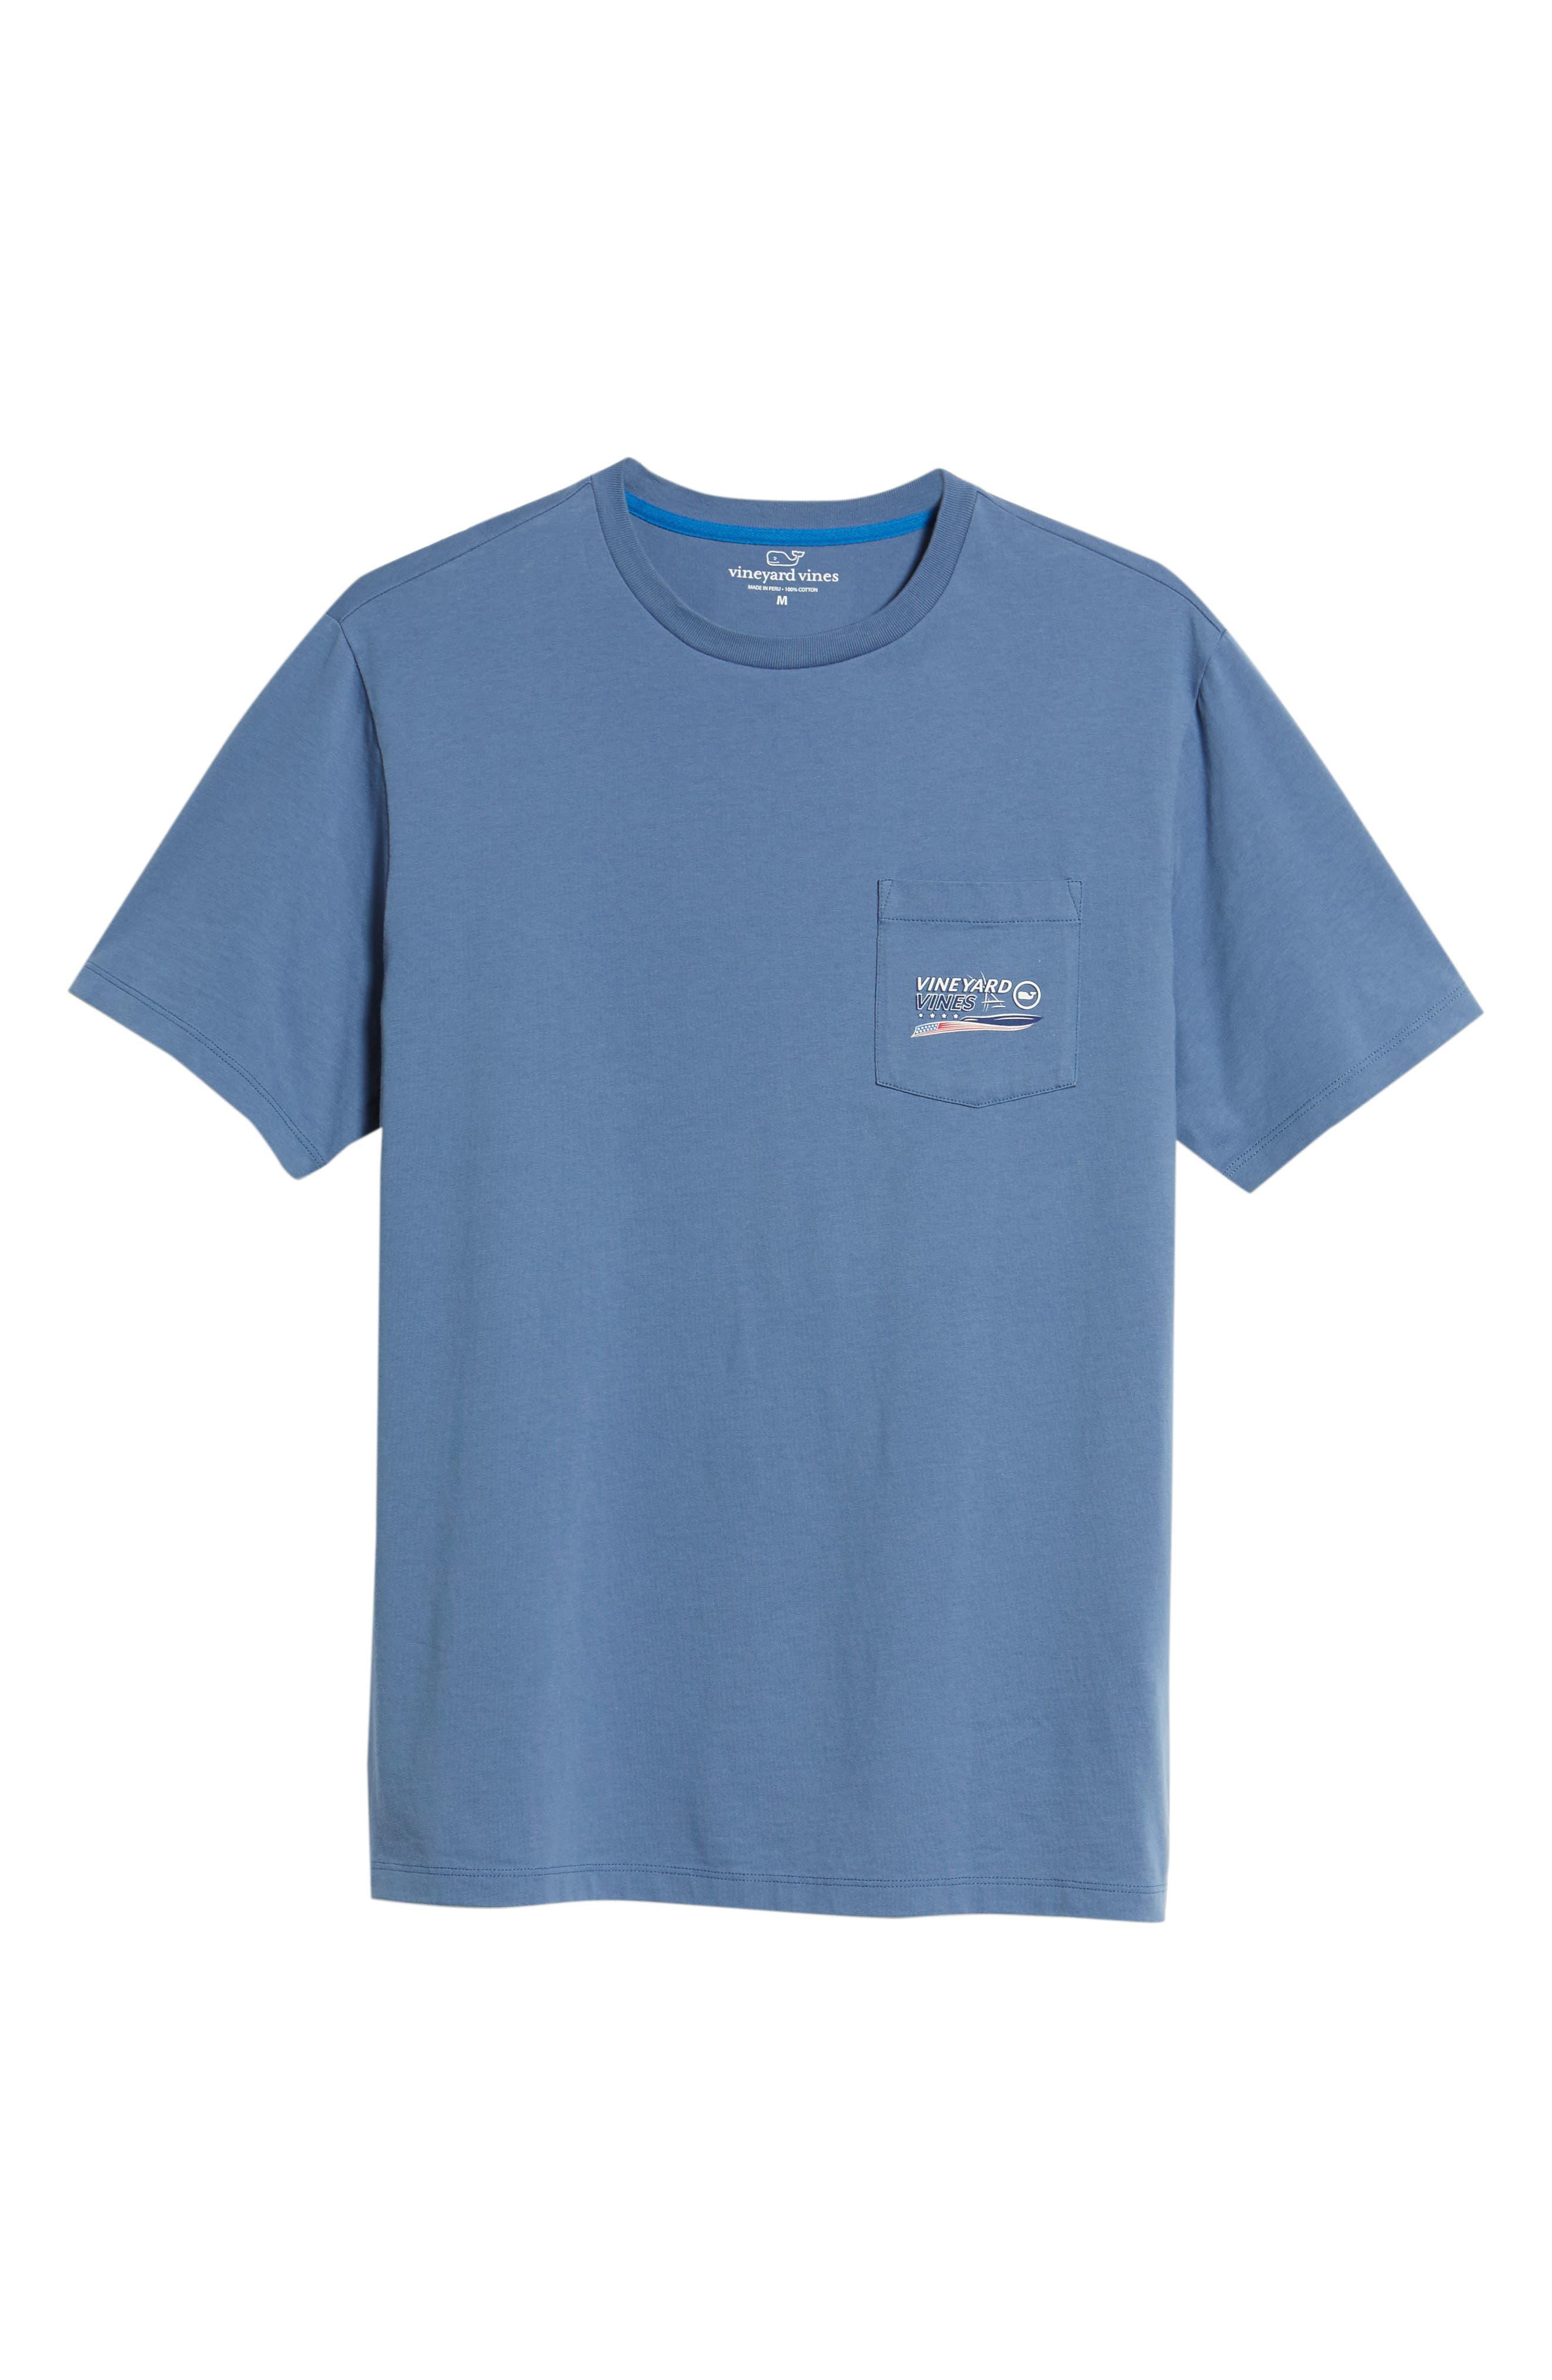 American Sportfisher T-Shirt,                             Alternate thumbnail 6, color,